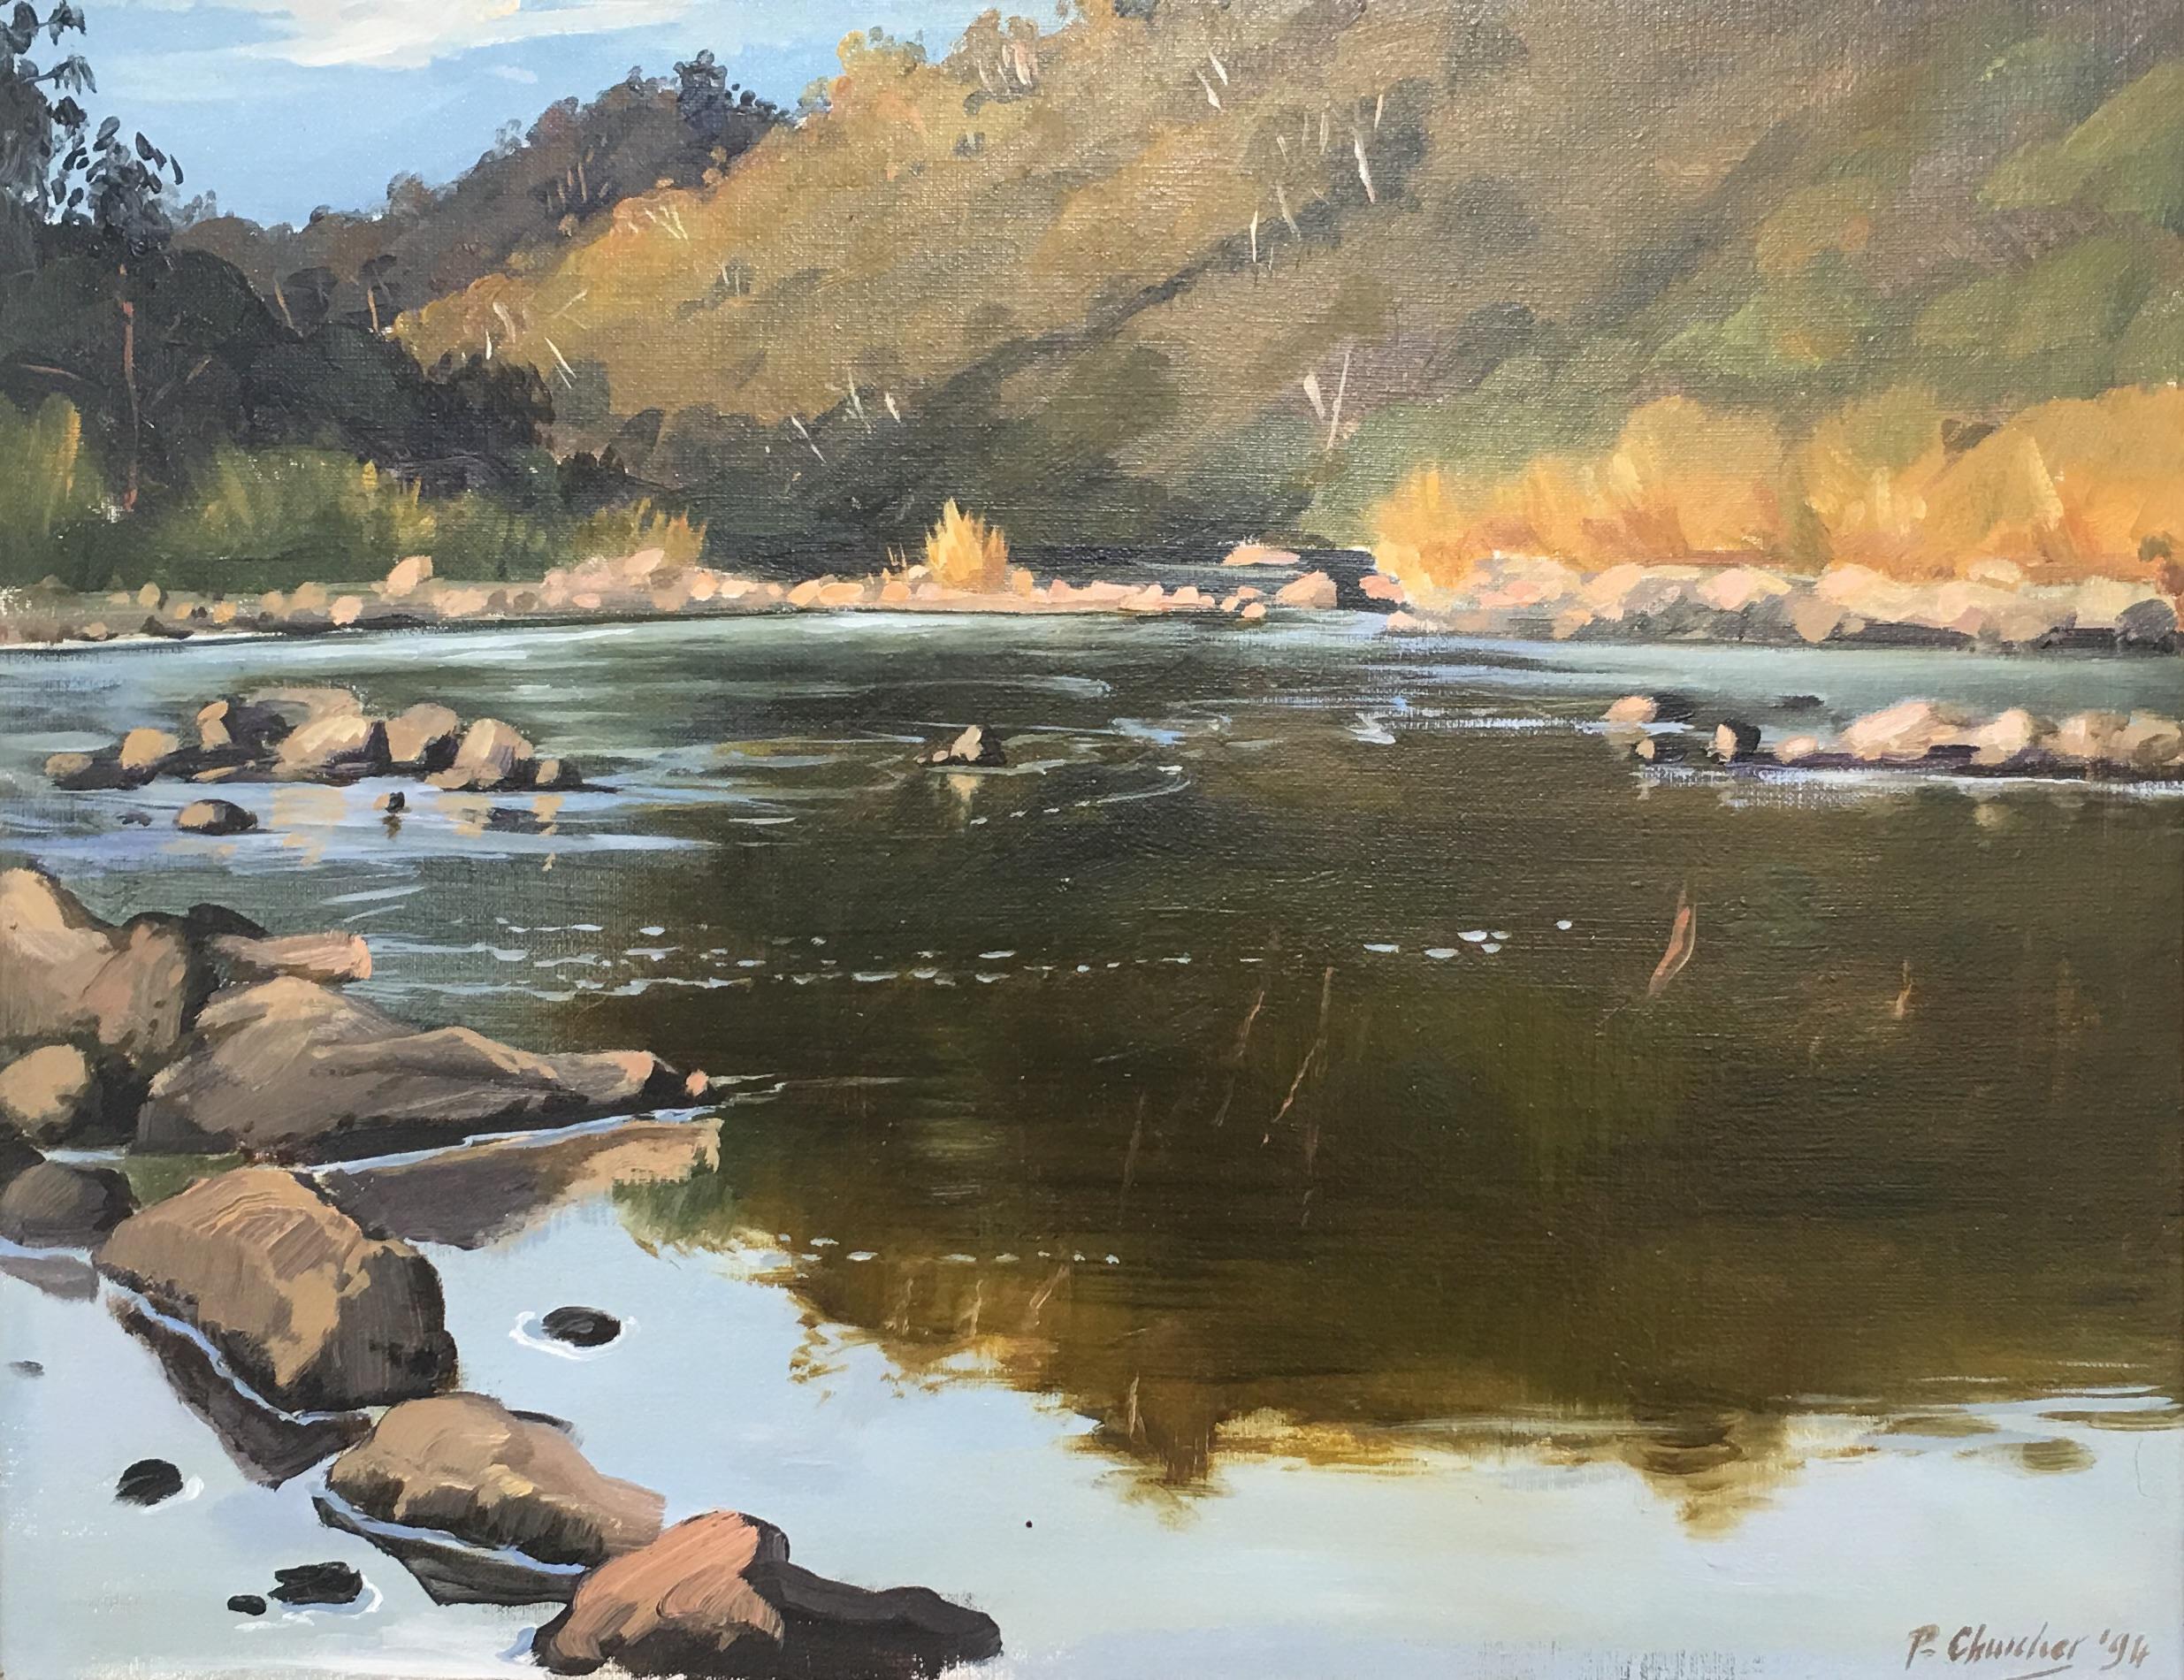 202117 Churcher Snowy River Dusk Buchan